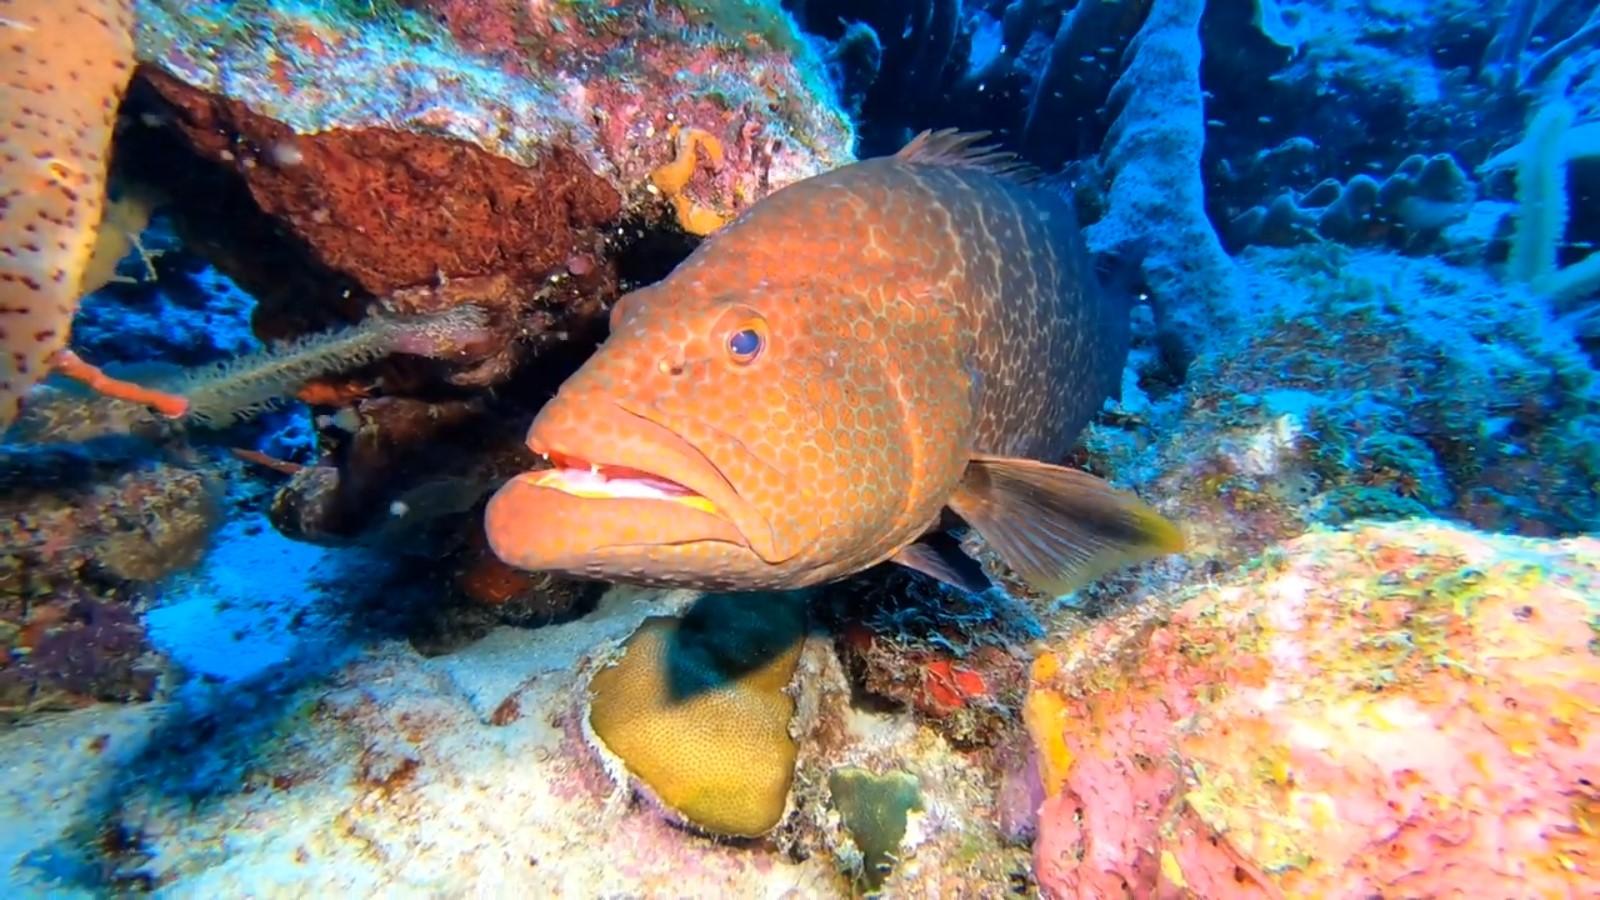 Mengenal Jenis Jenis Ikan Karang Demersal Cerita Pesisir